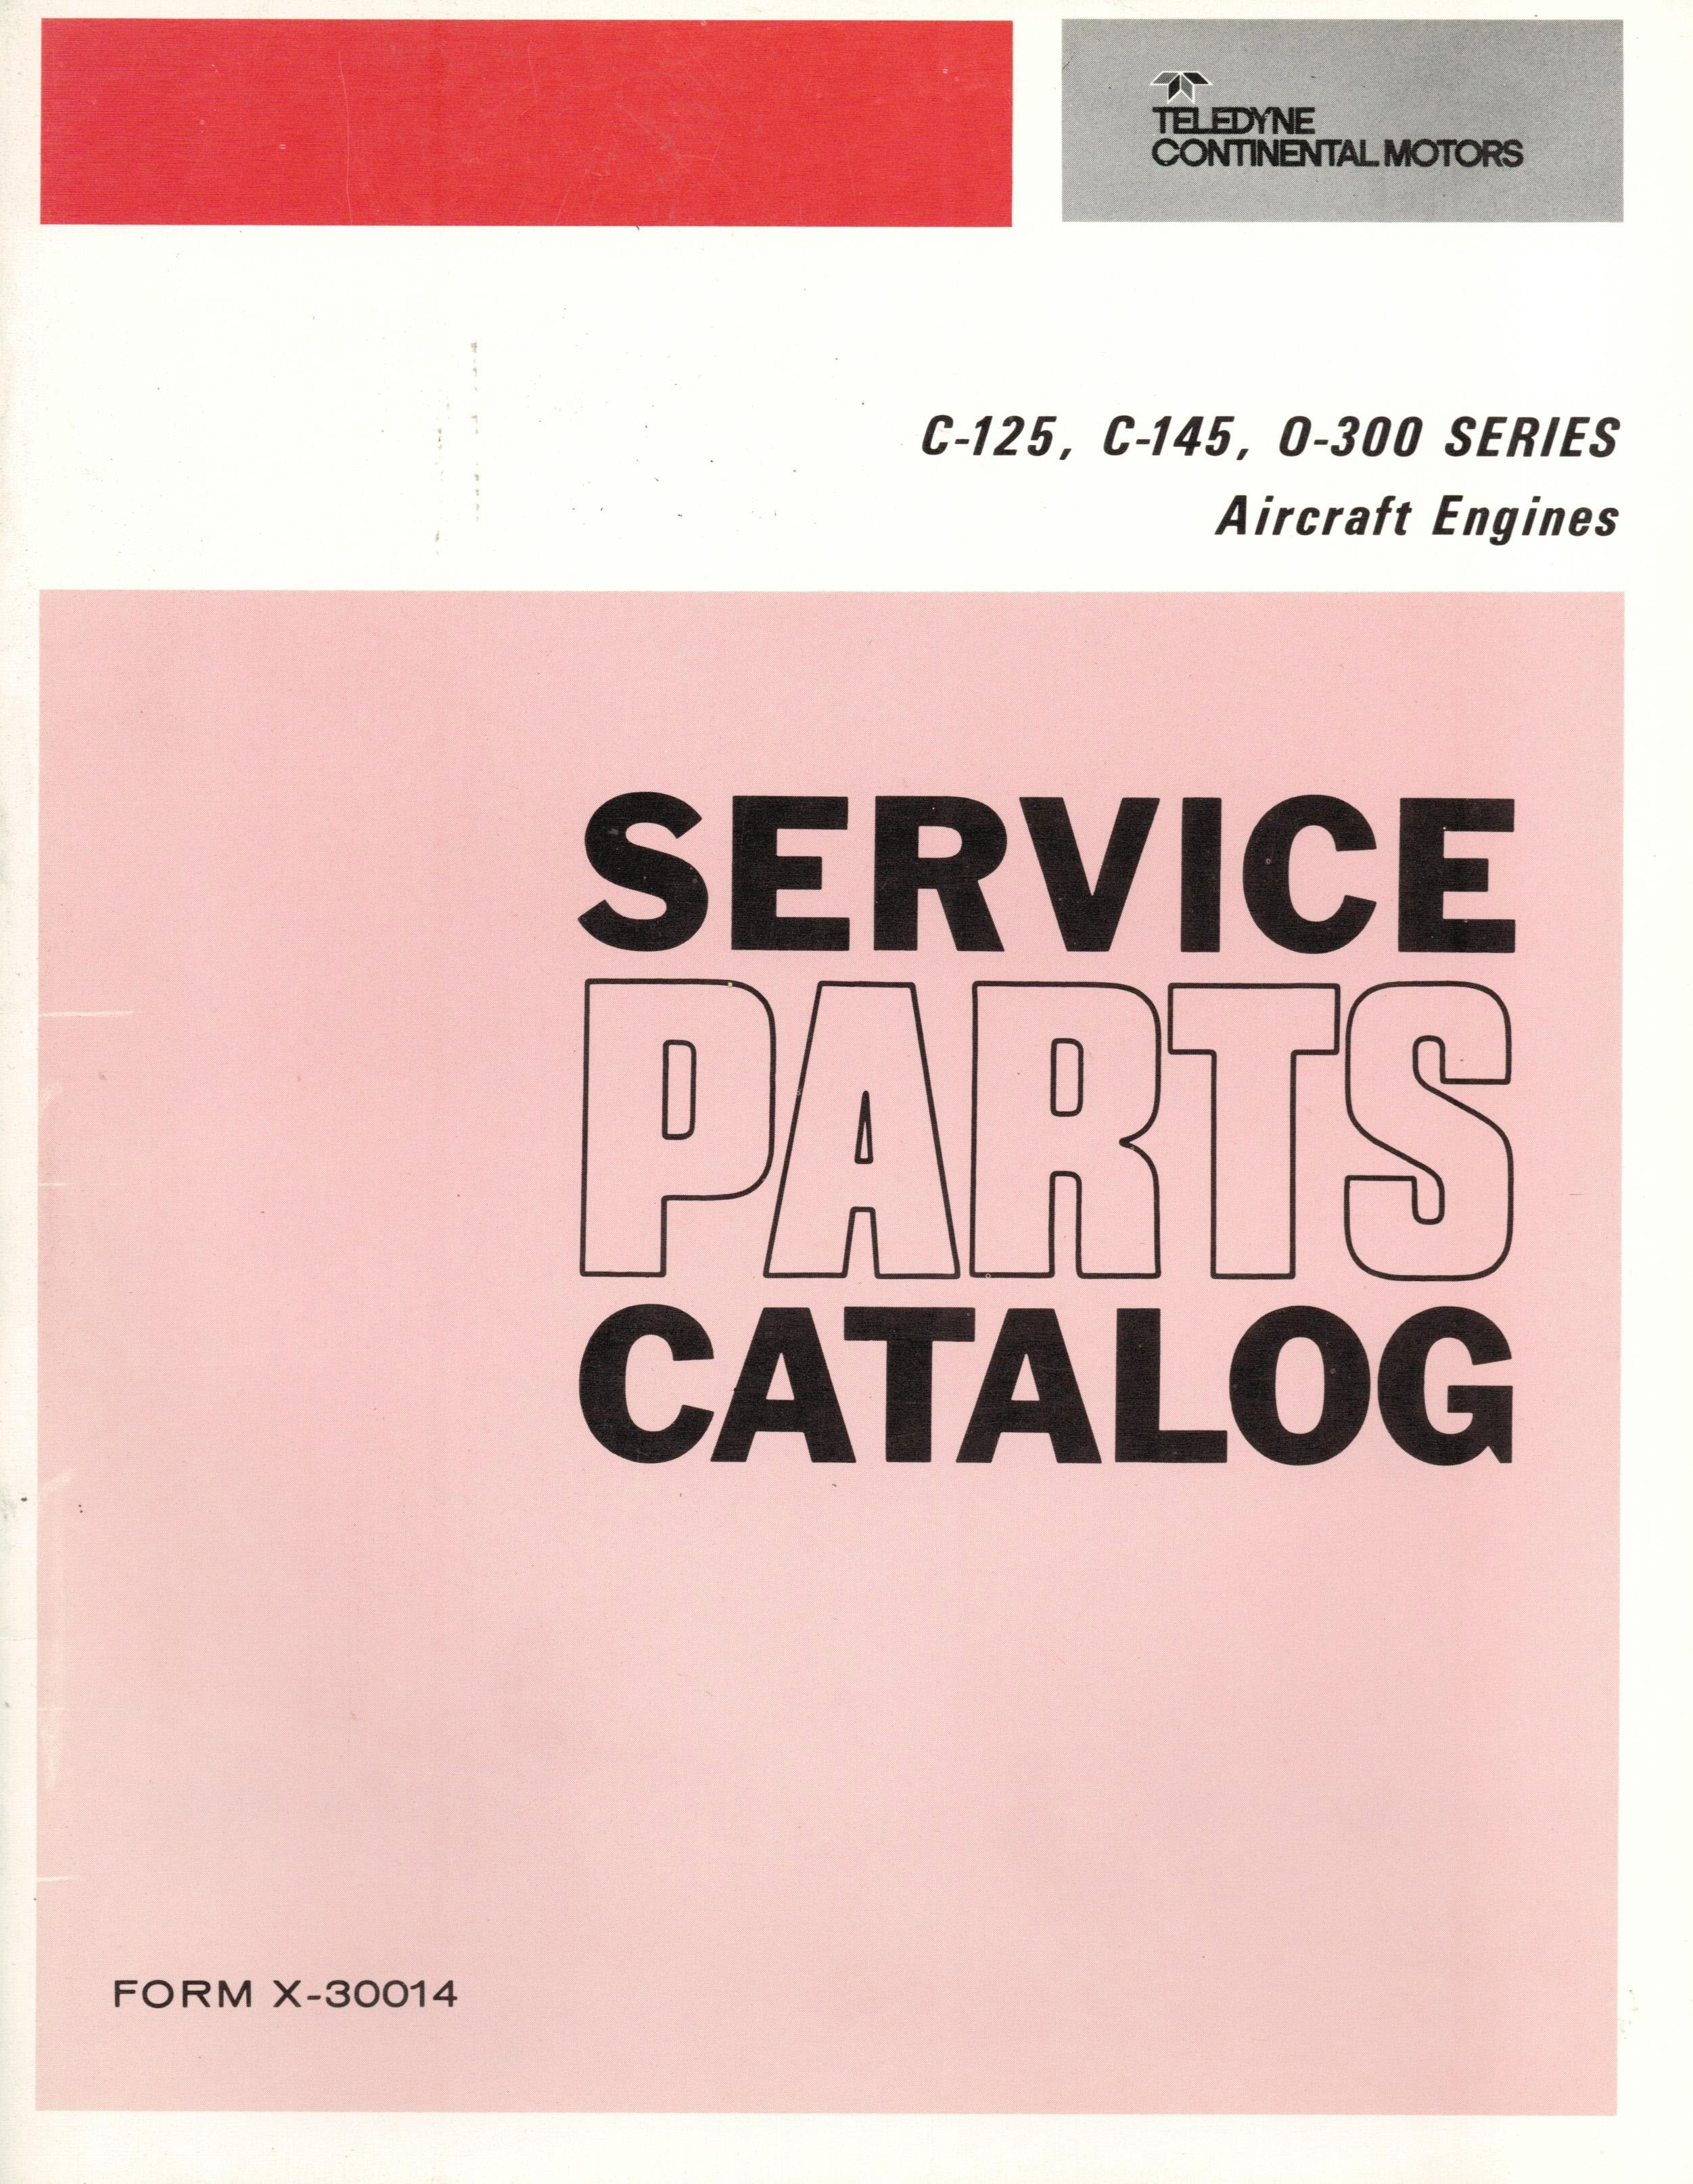 X-30014 Manual, Service Parts - Fresno Airparts Co